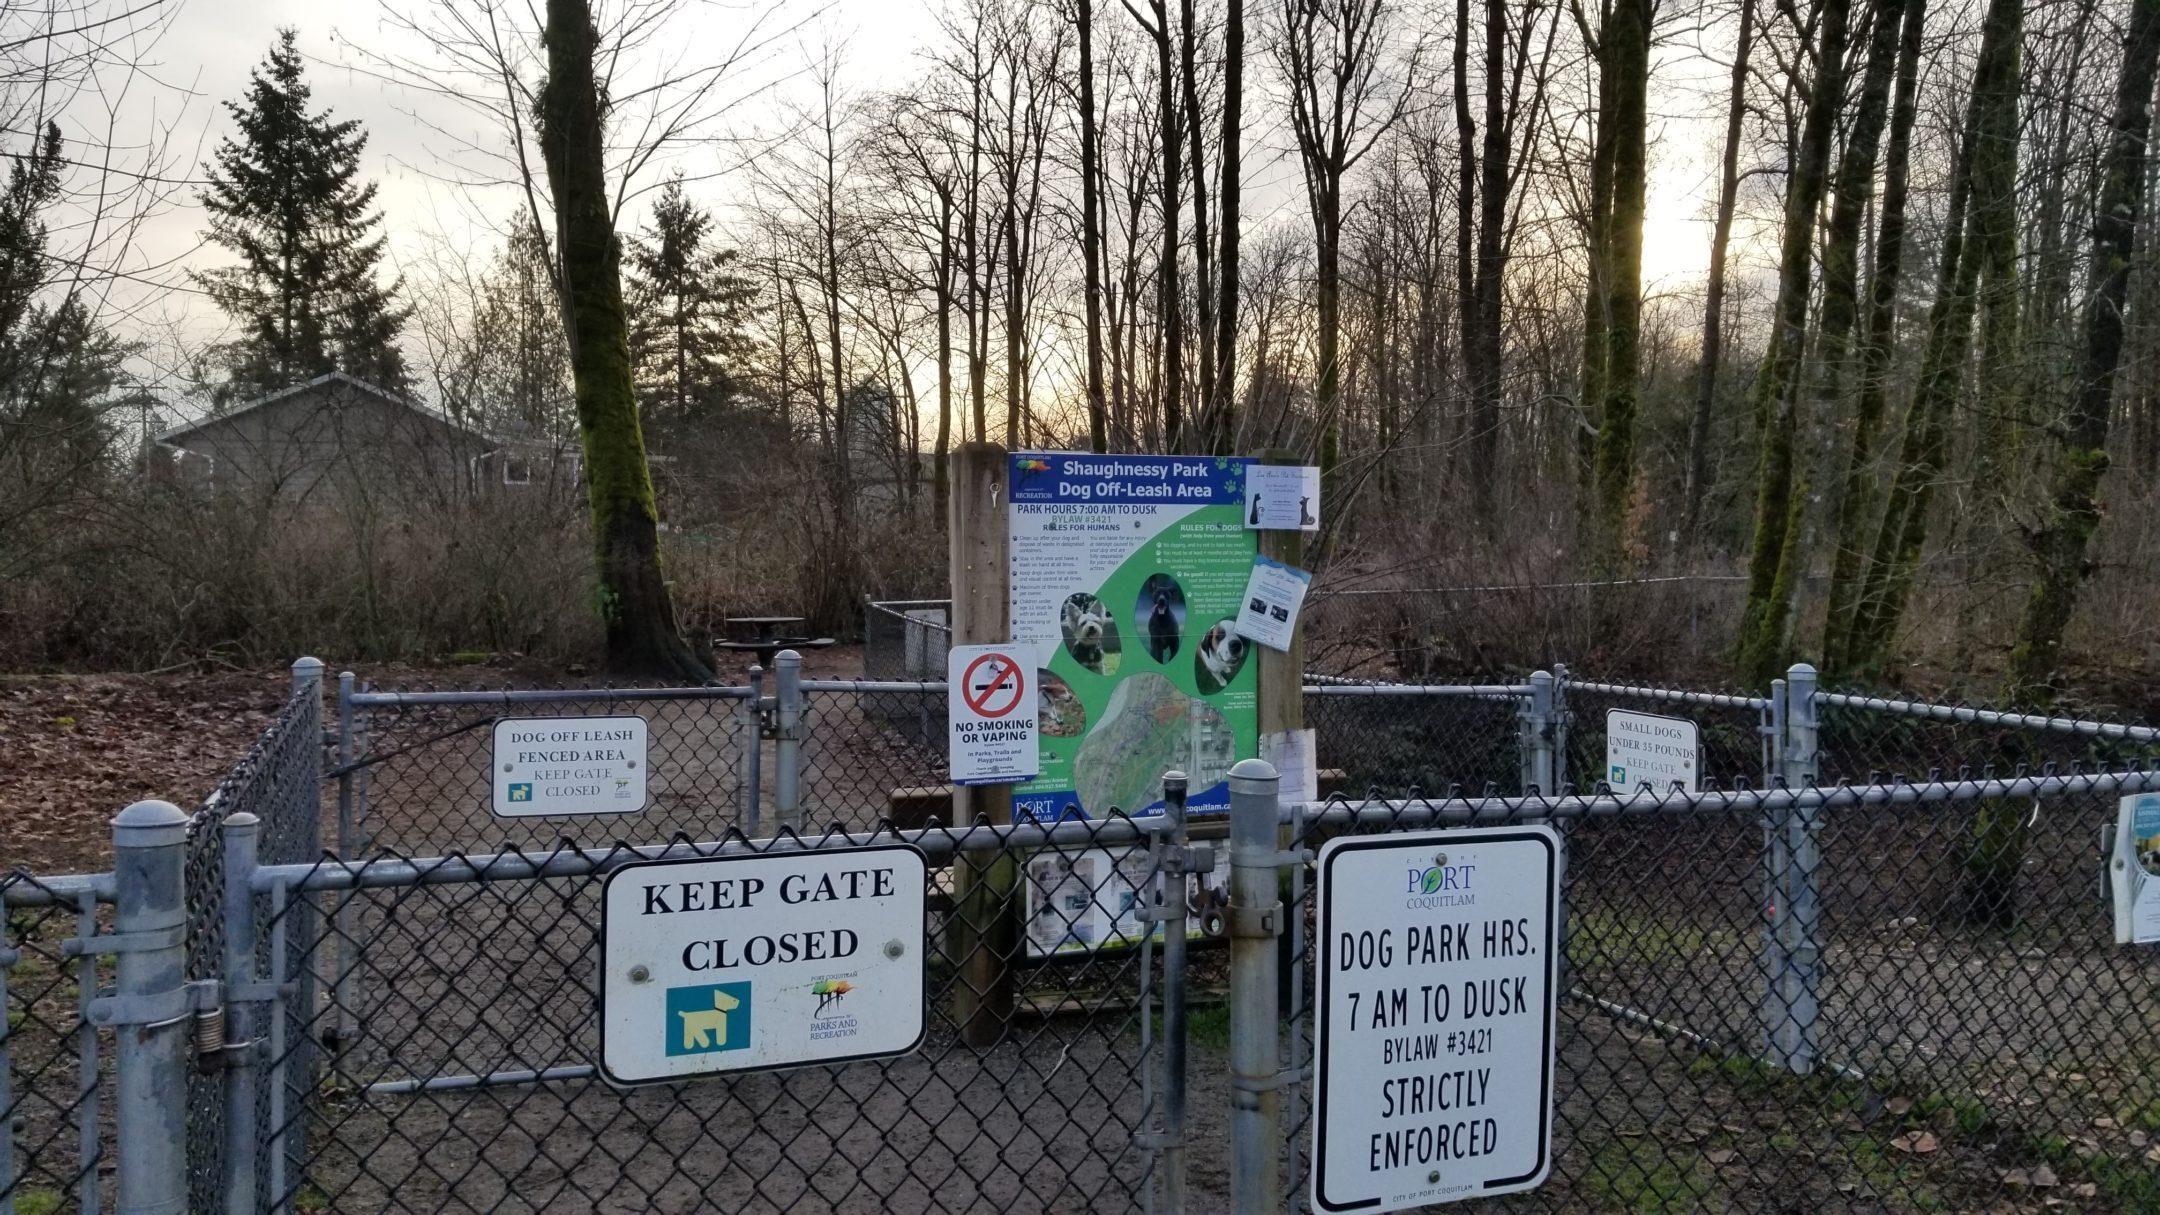 Shaughnessy Park Off-Leash Dog Park - Port Coquitlam - BC (10)